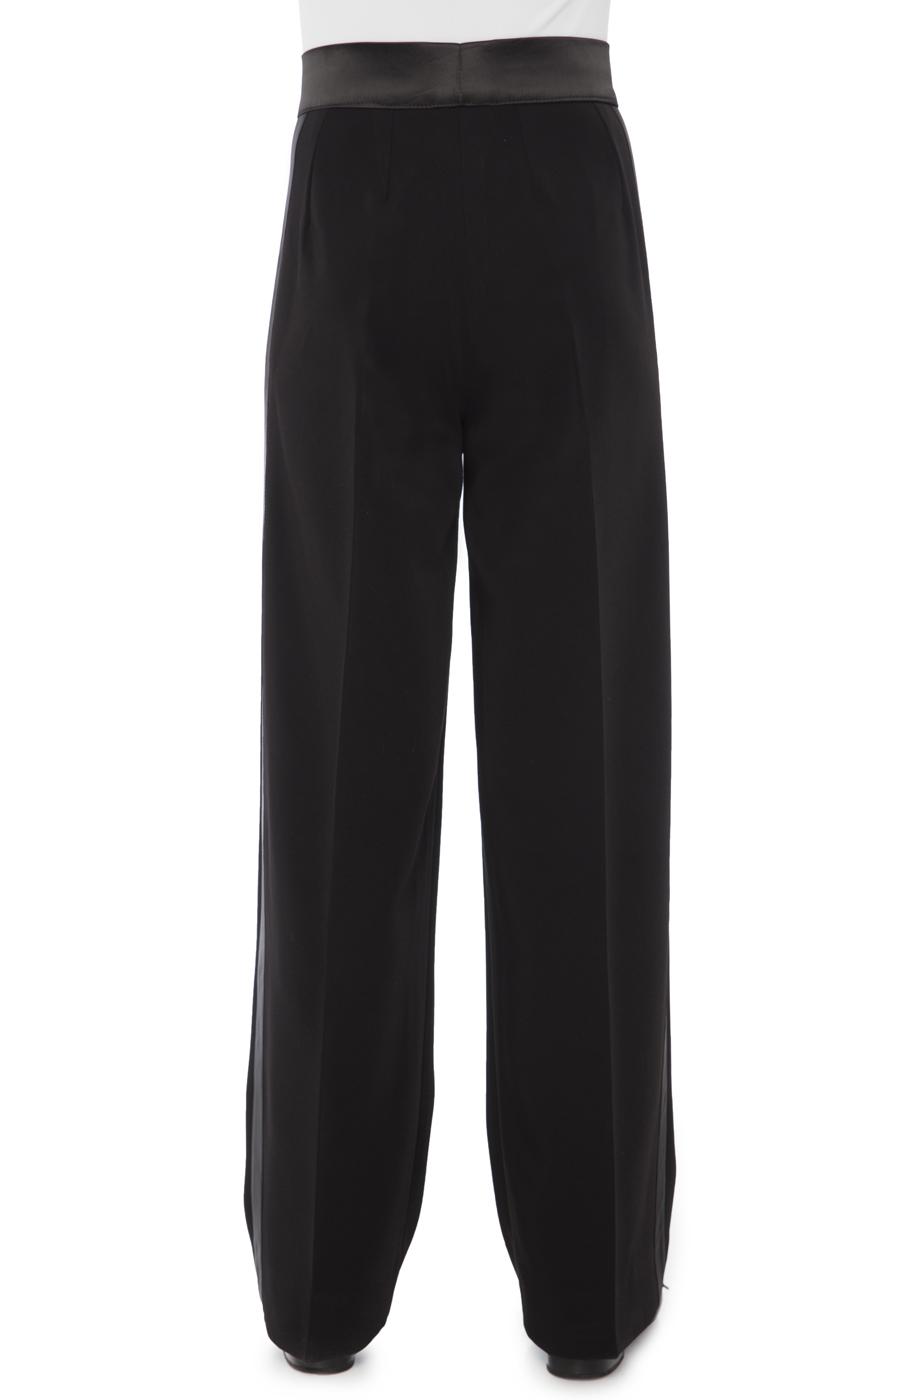 Juvenile trouser with satin binding